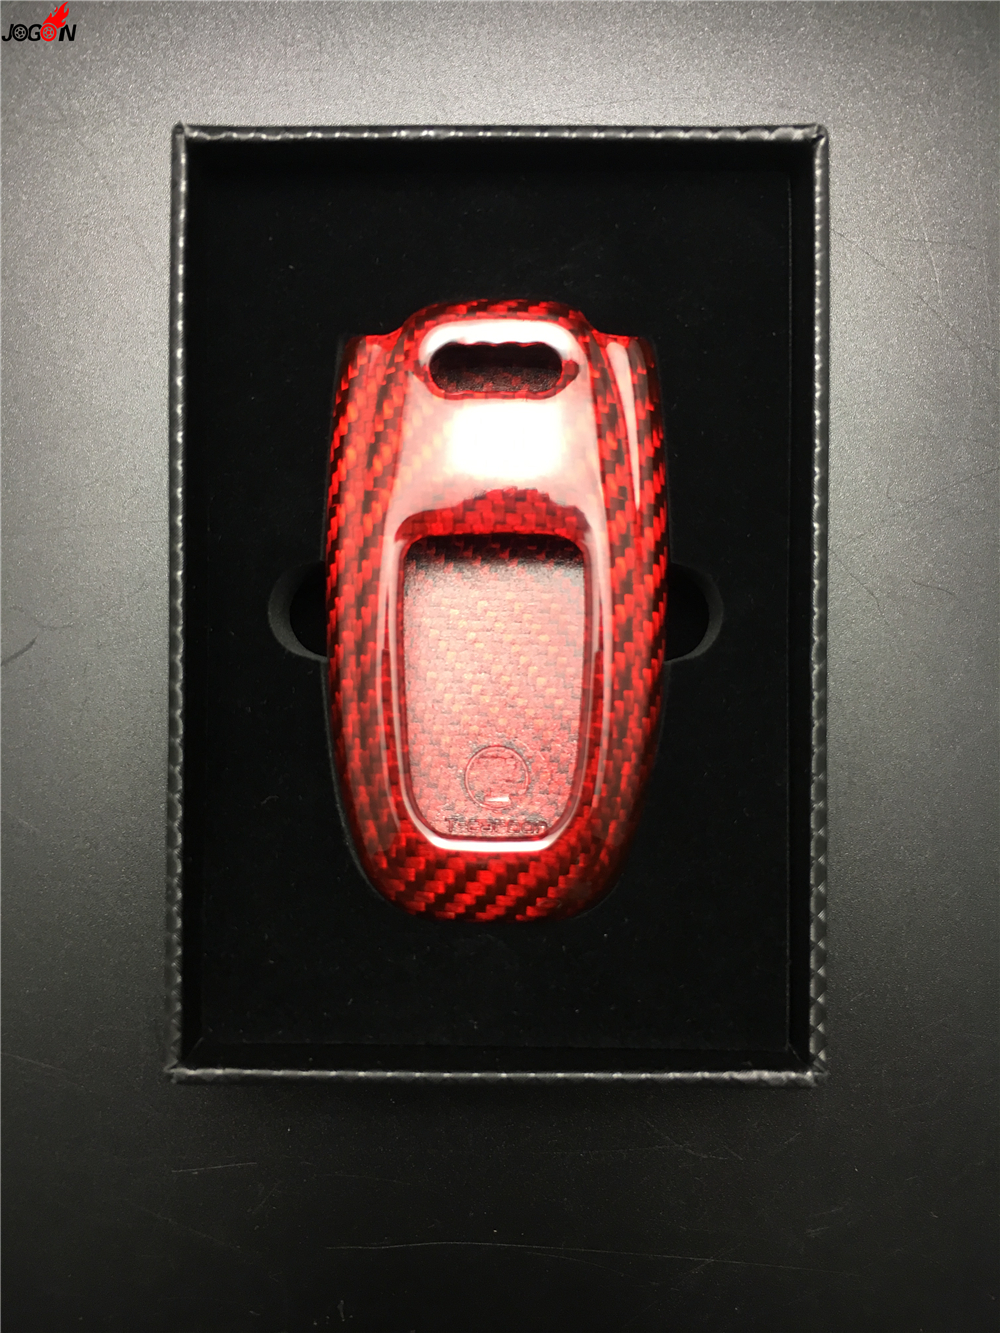 Karbon Fiber Koruyucu Uzaktan Anahtar Fob Vaka Kapak Için Audi A4 A4L A5 A6 A6L A7 A8L Q5 Q7 S5 SQ5 S6 S7 S8